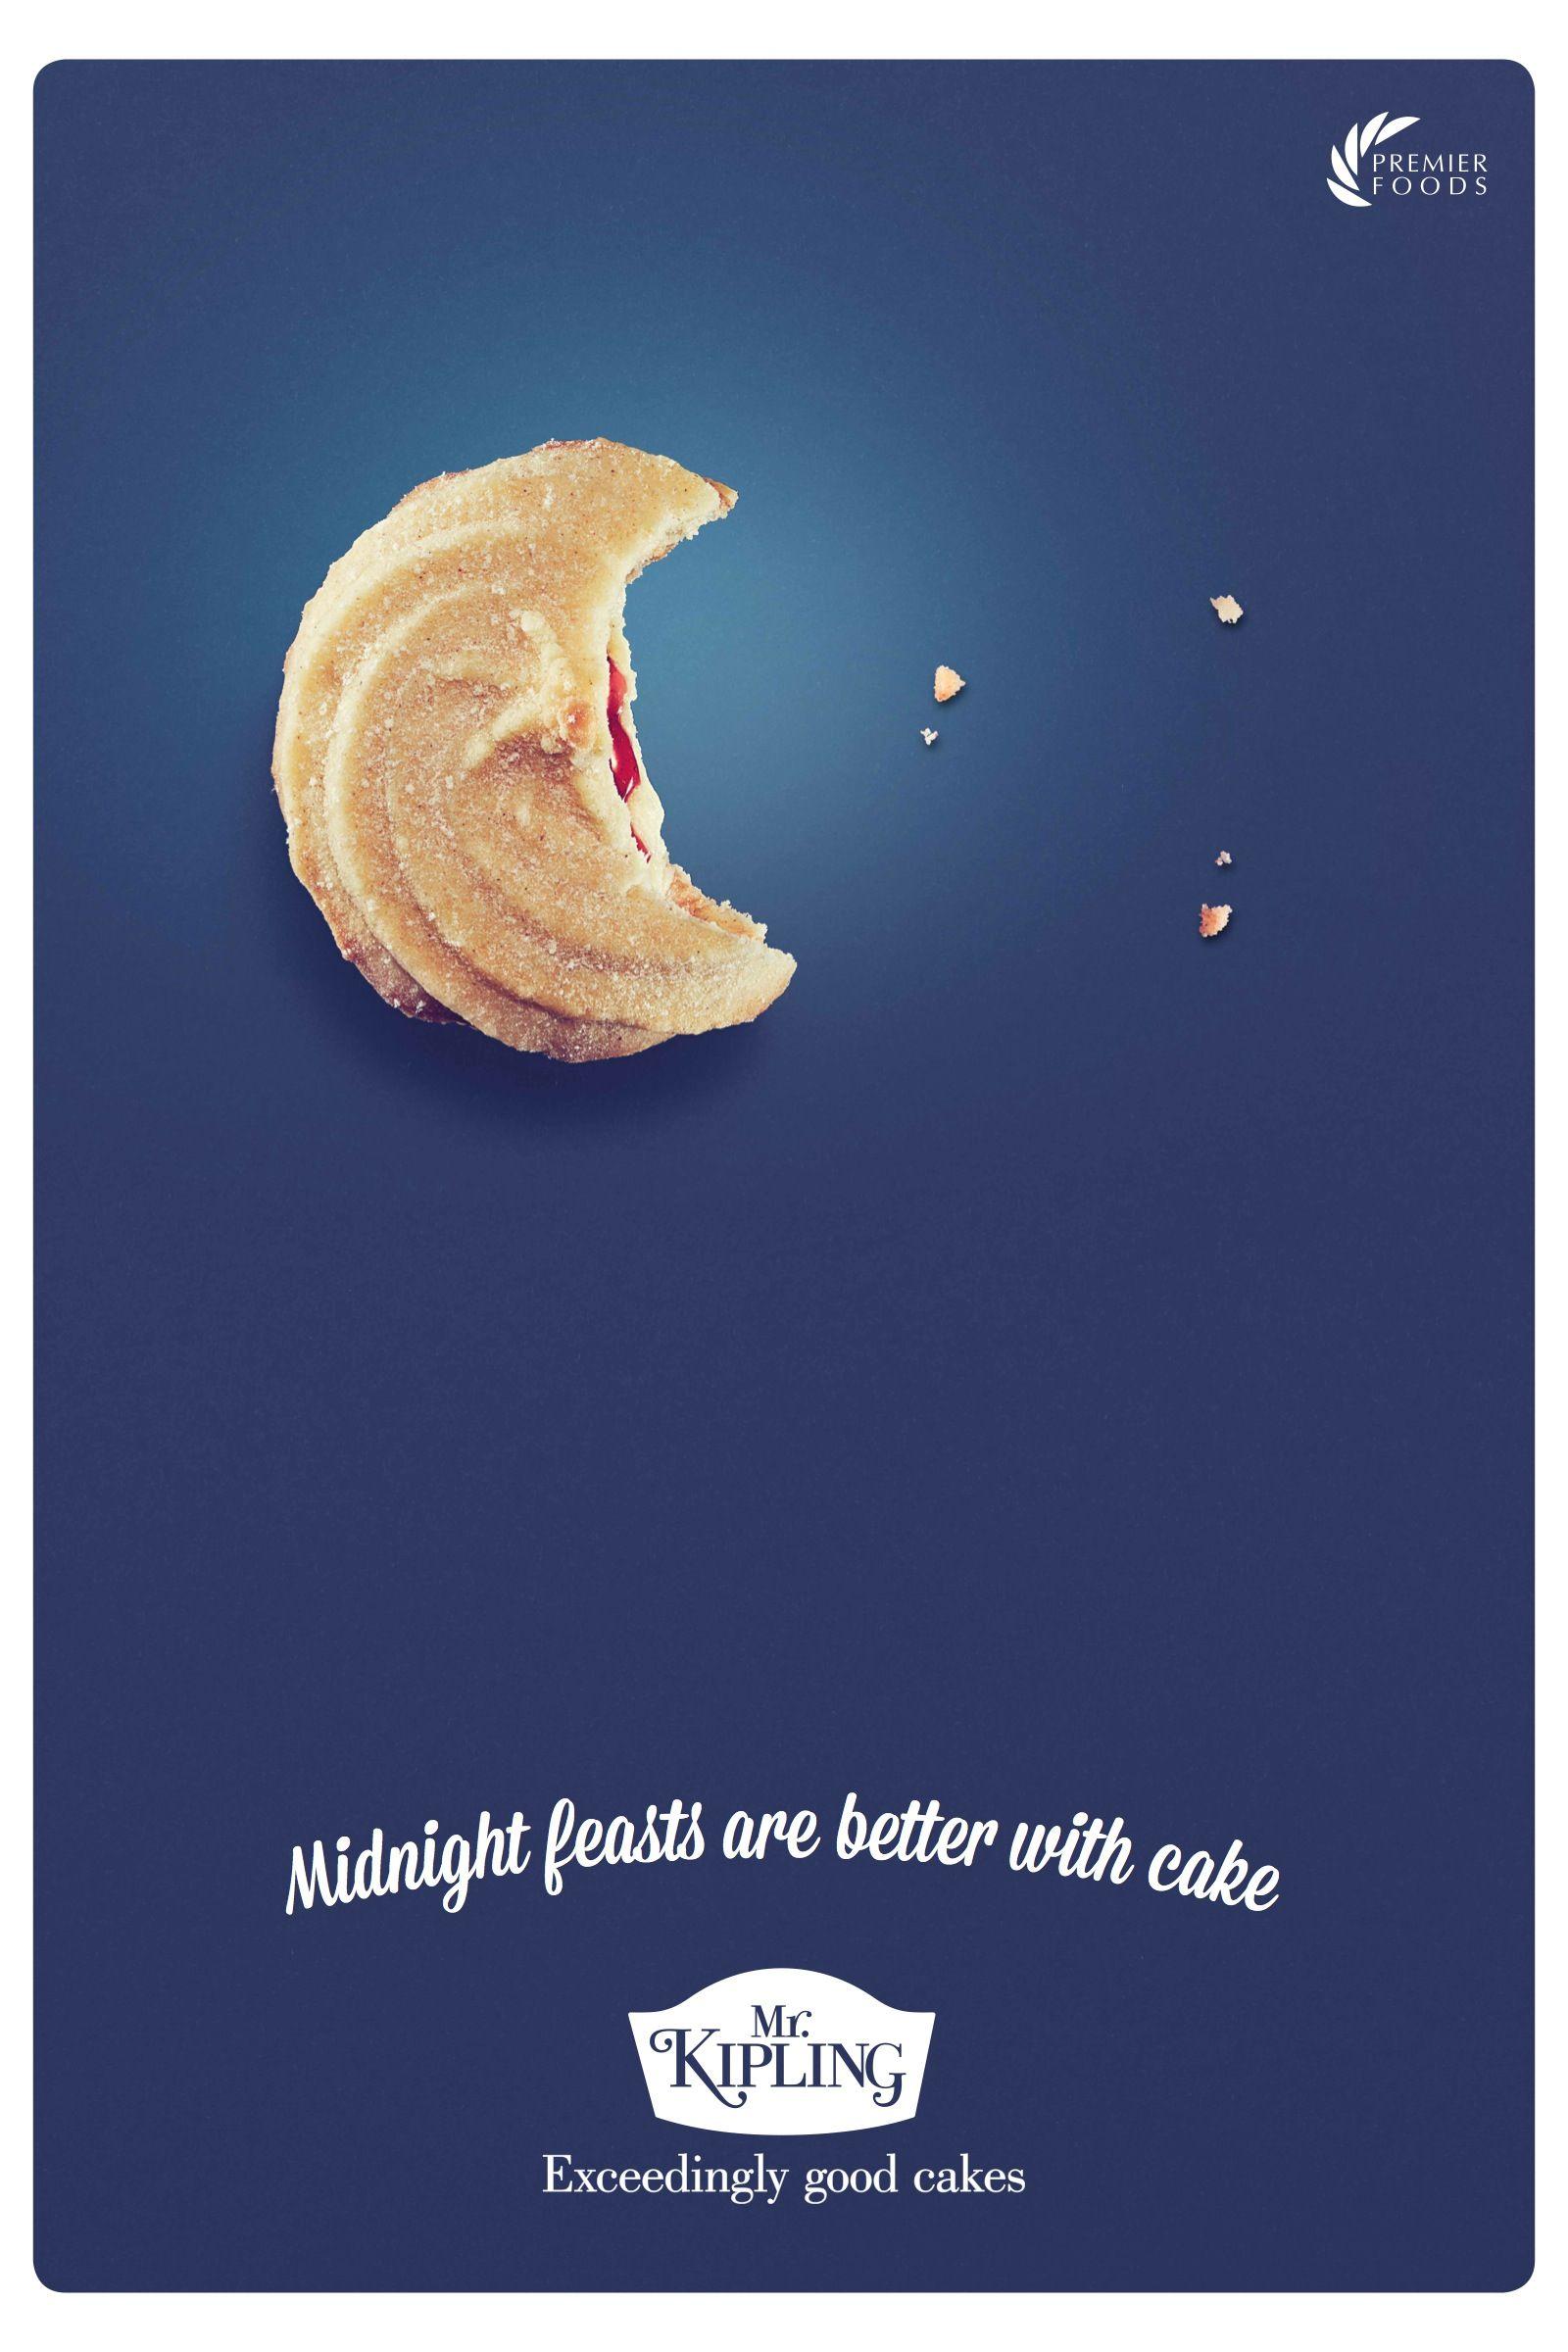 Mr kipling exceedingly good cakes ads creative food